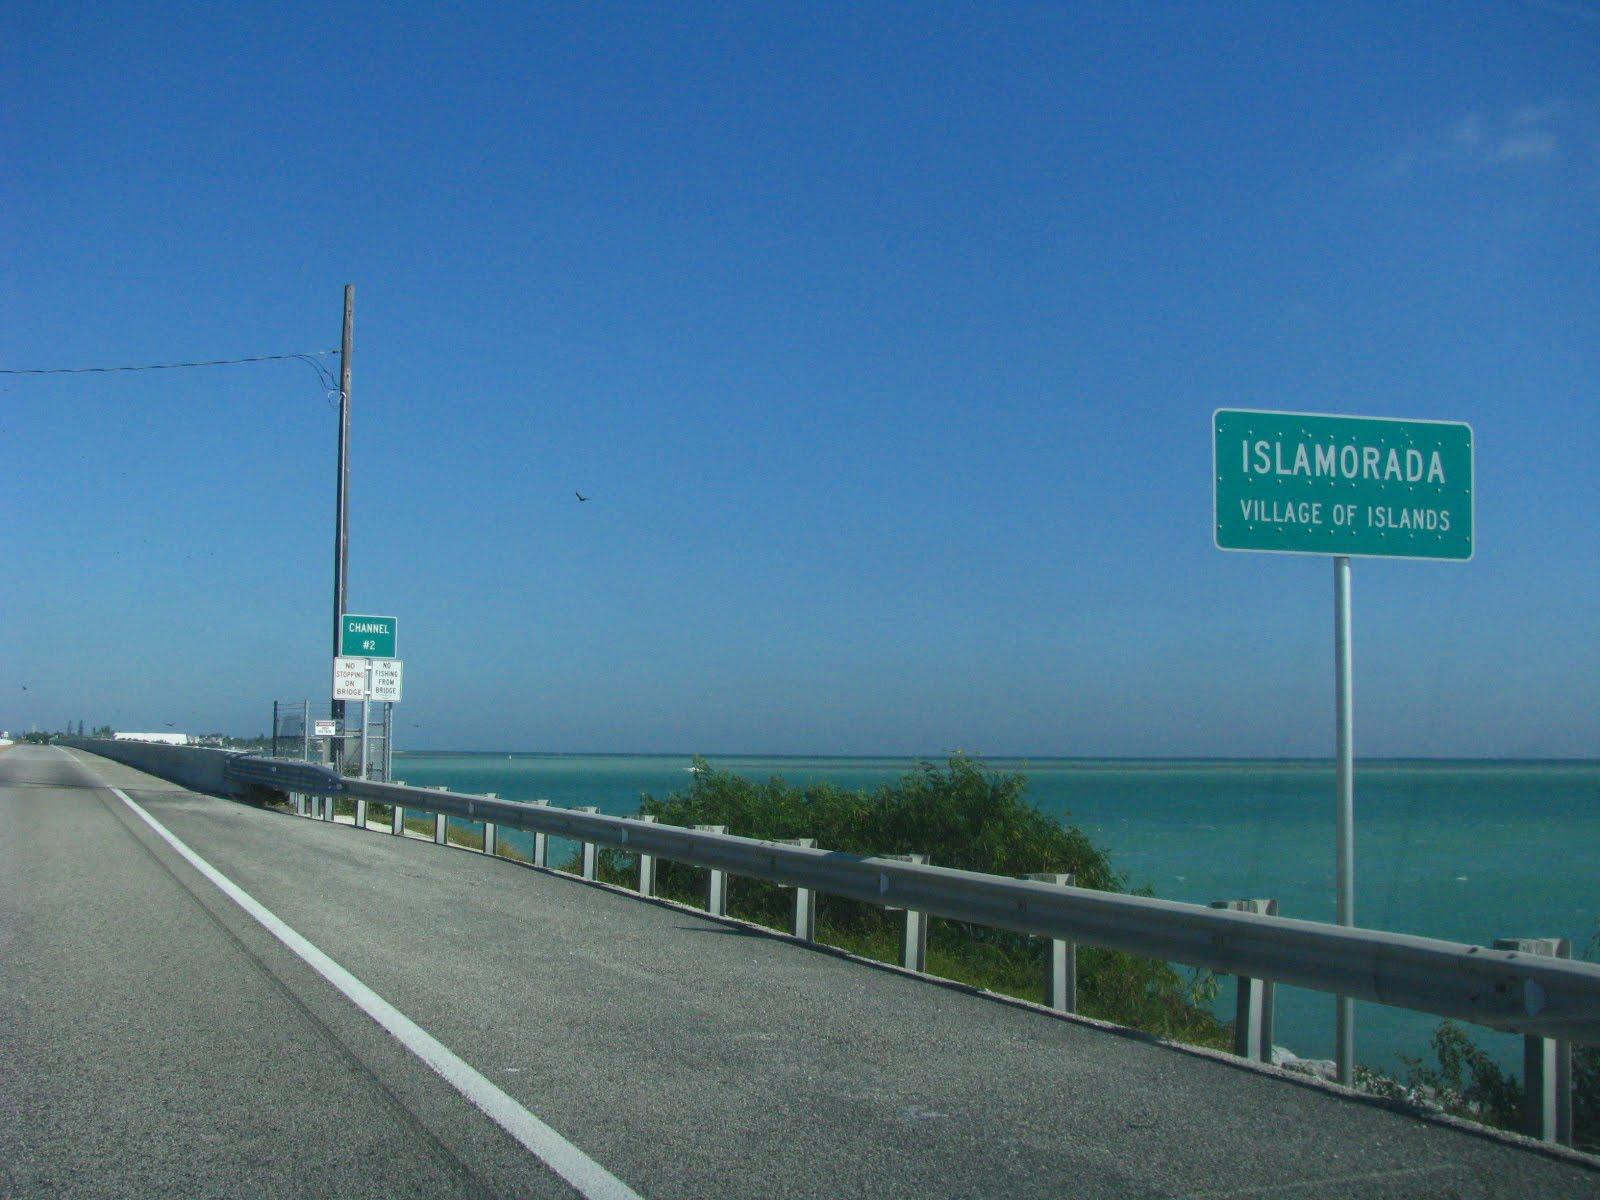 Key west diary islamorada bridge walk for Florida keys bridge fishing